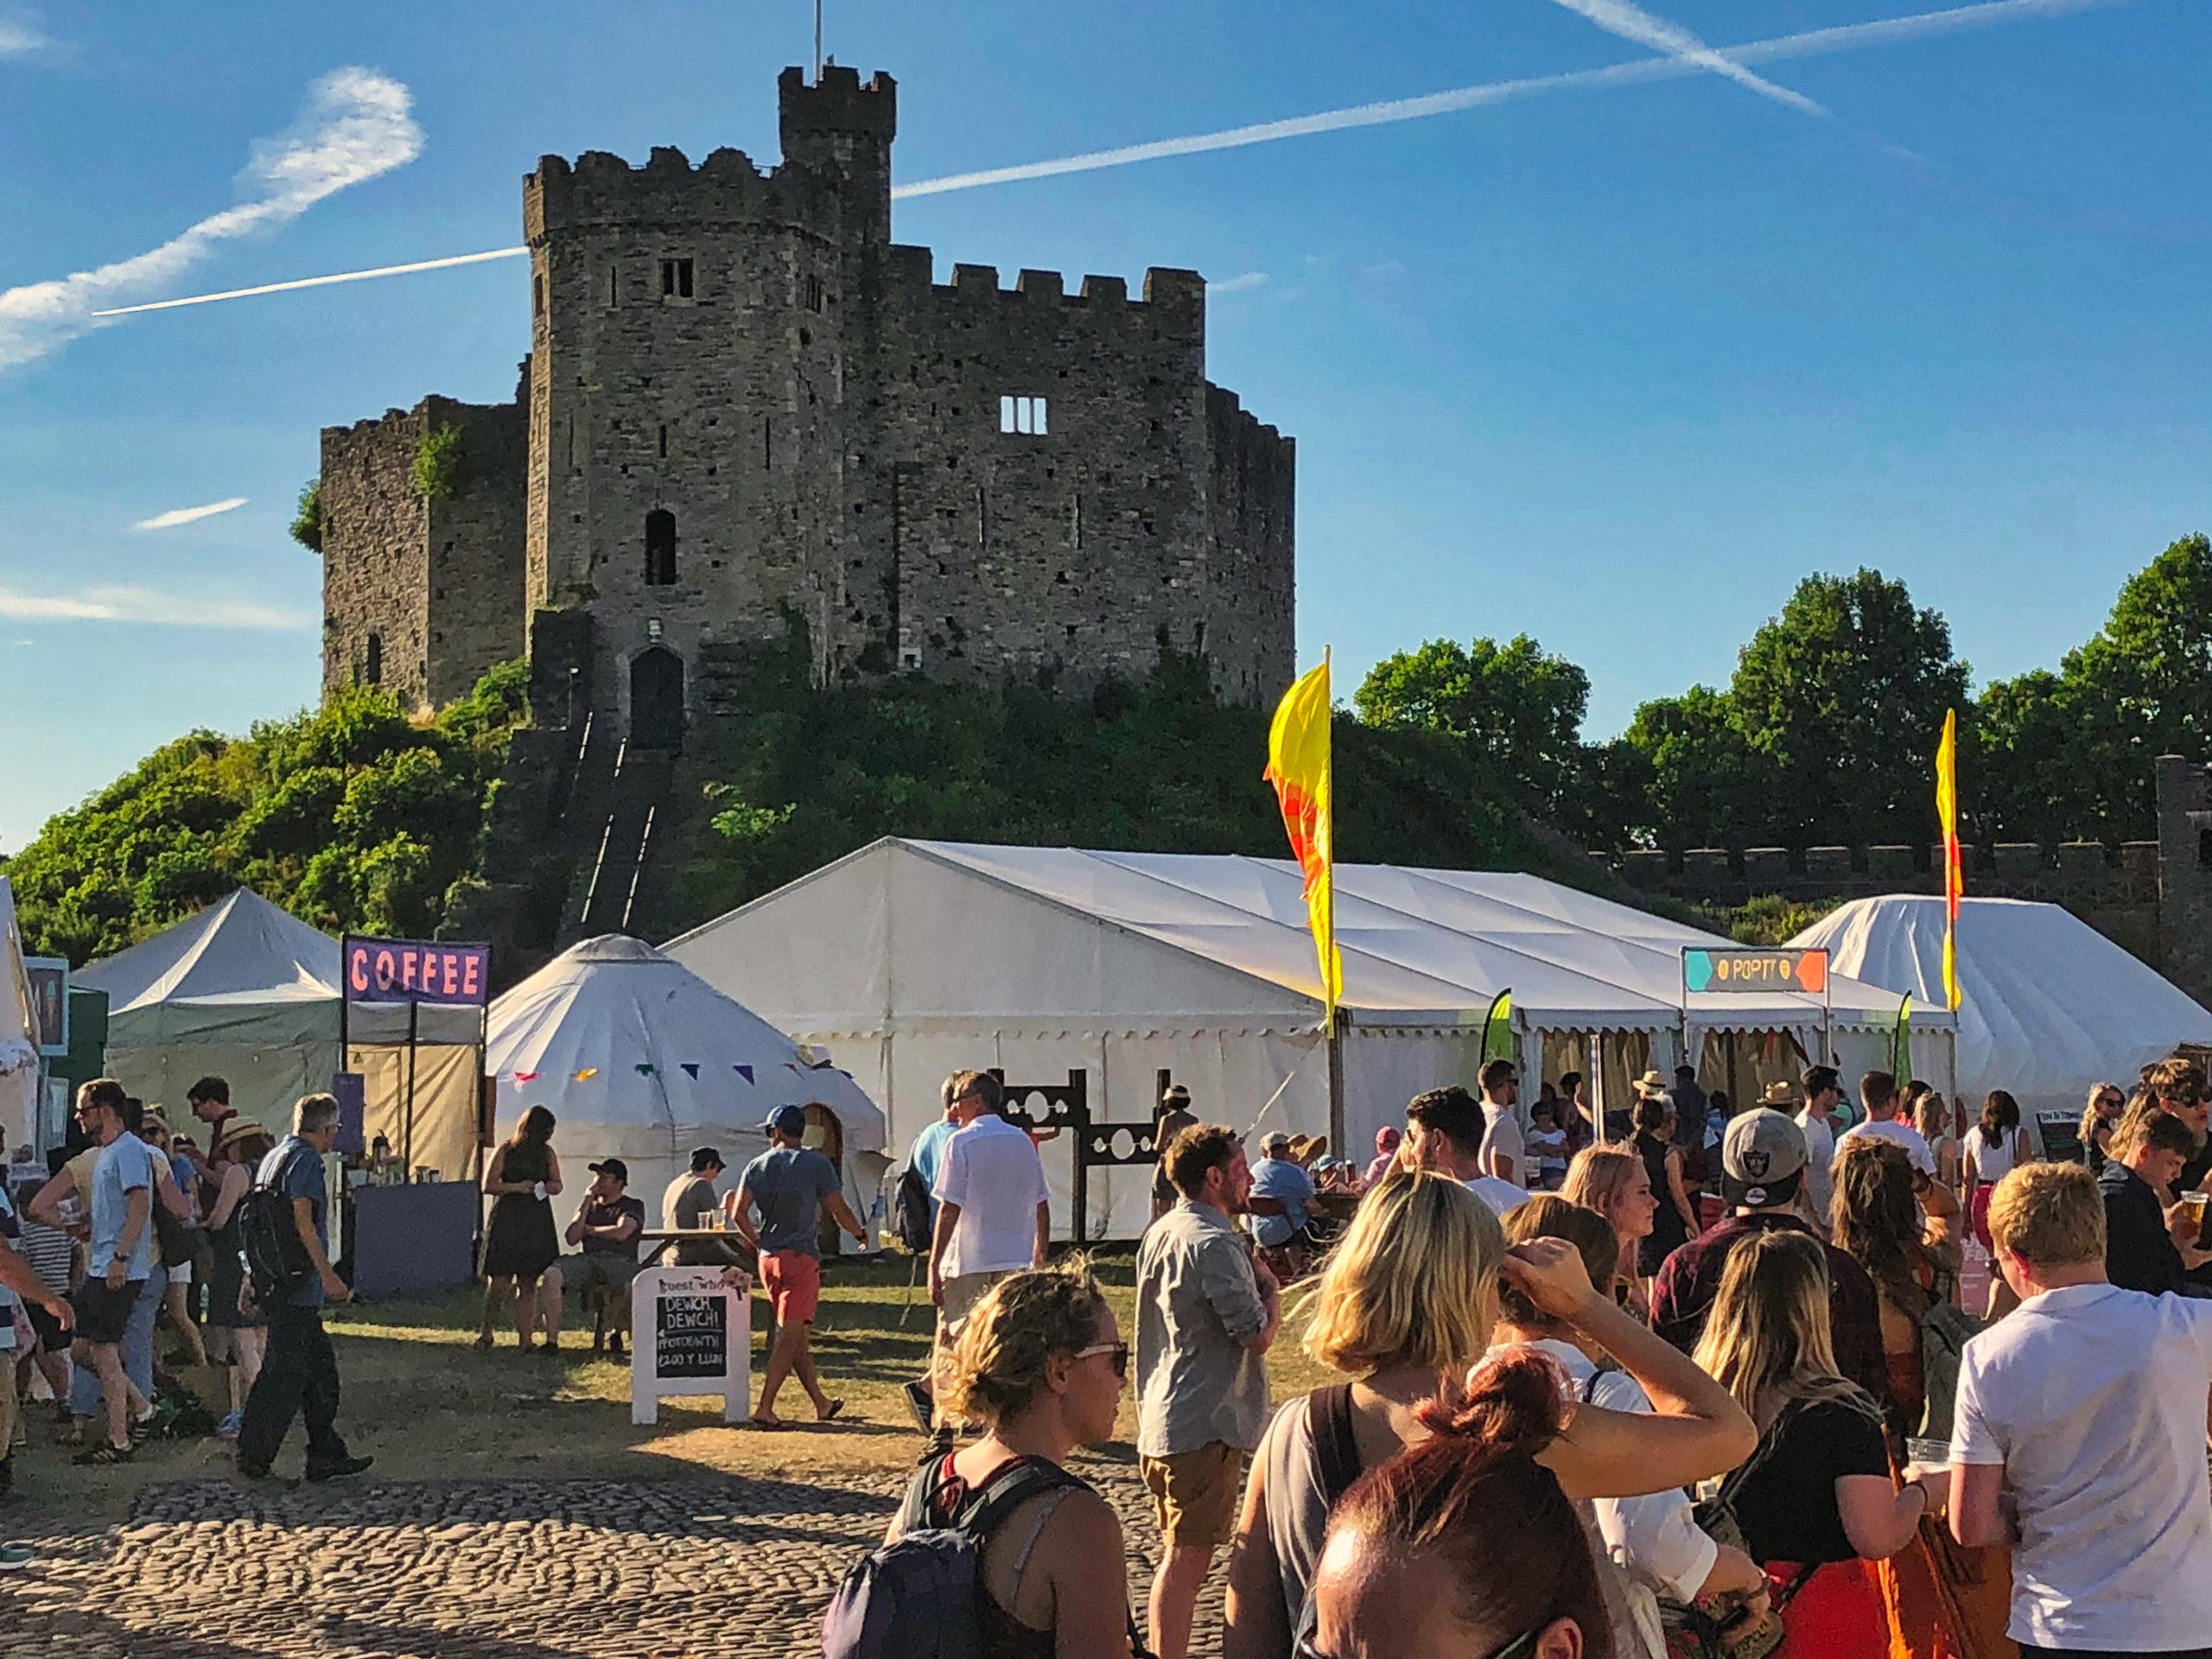 Fest auf dem Cardiff Castle